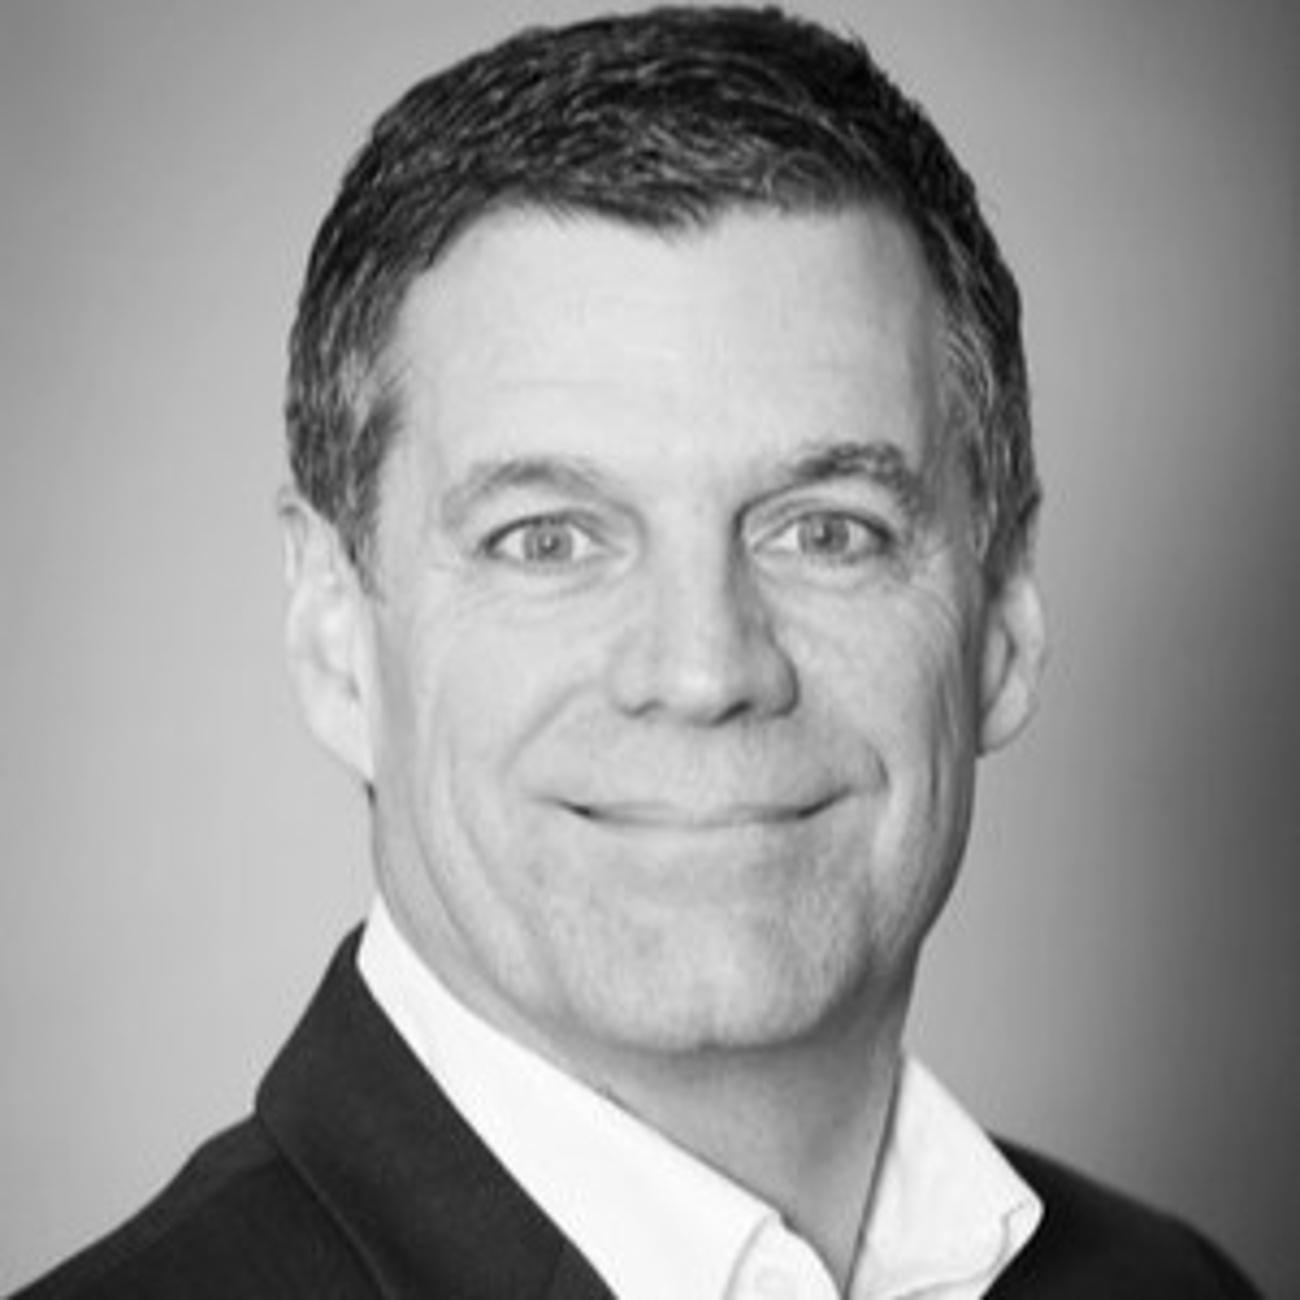 Founder & CEO Yves Marleau